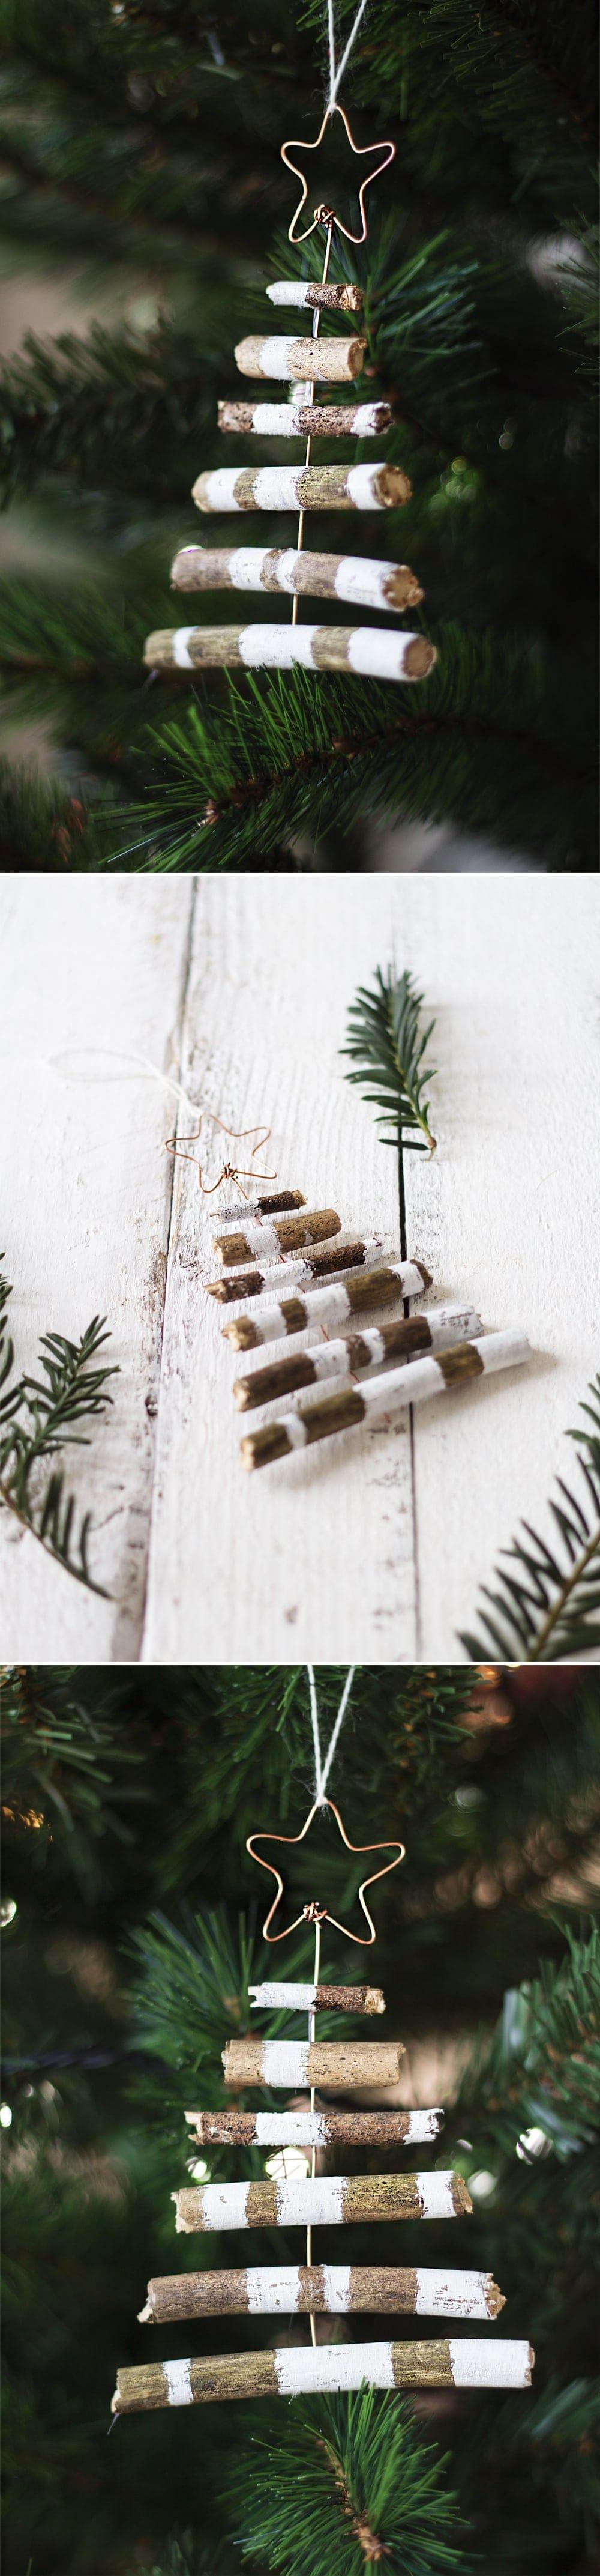 DIY tree decoration 4